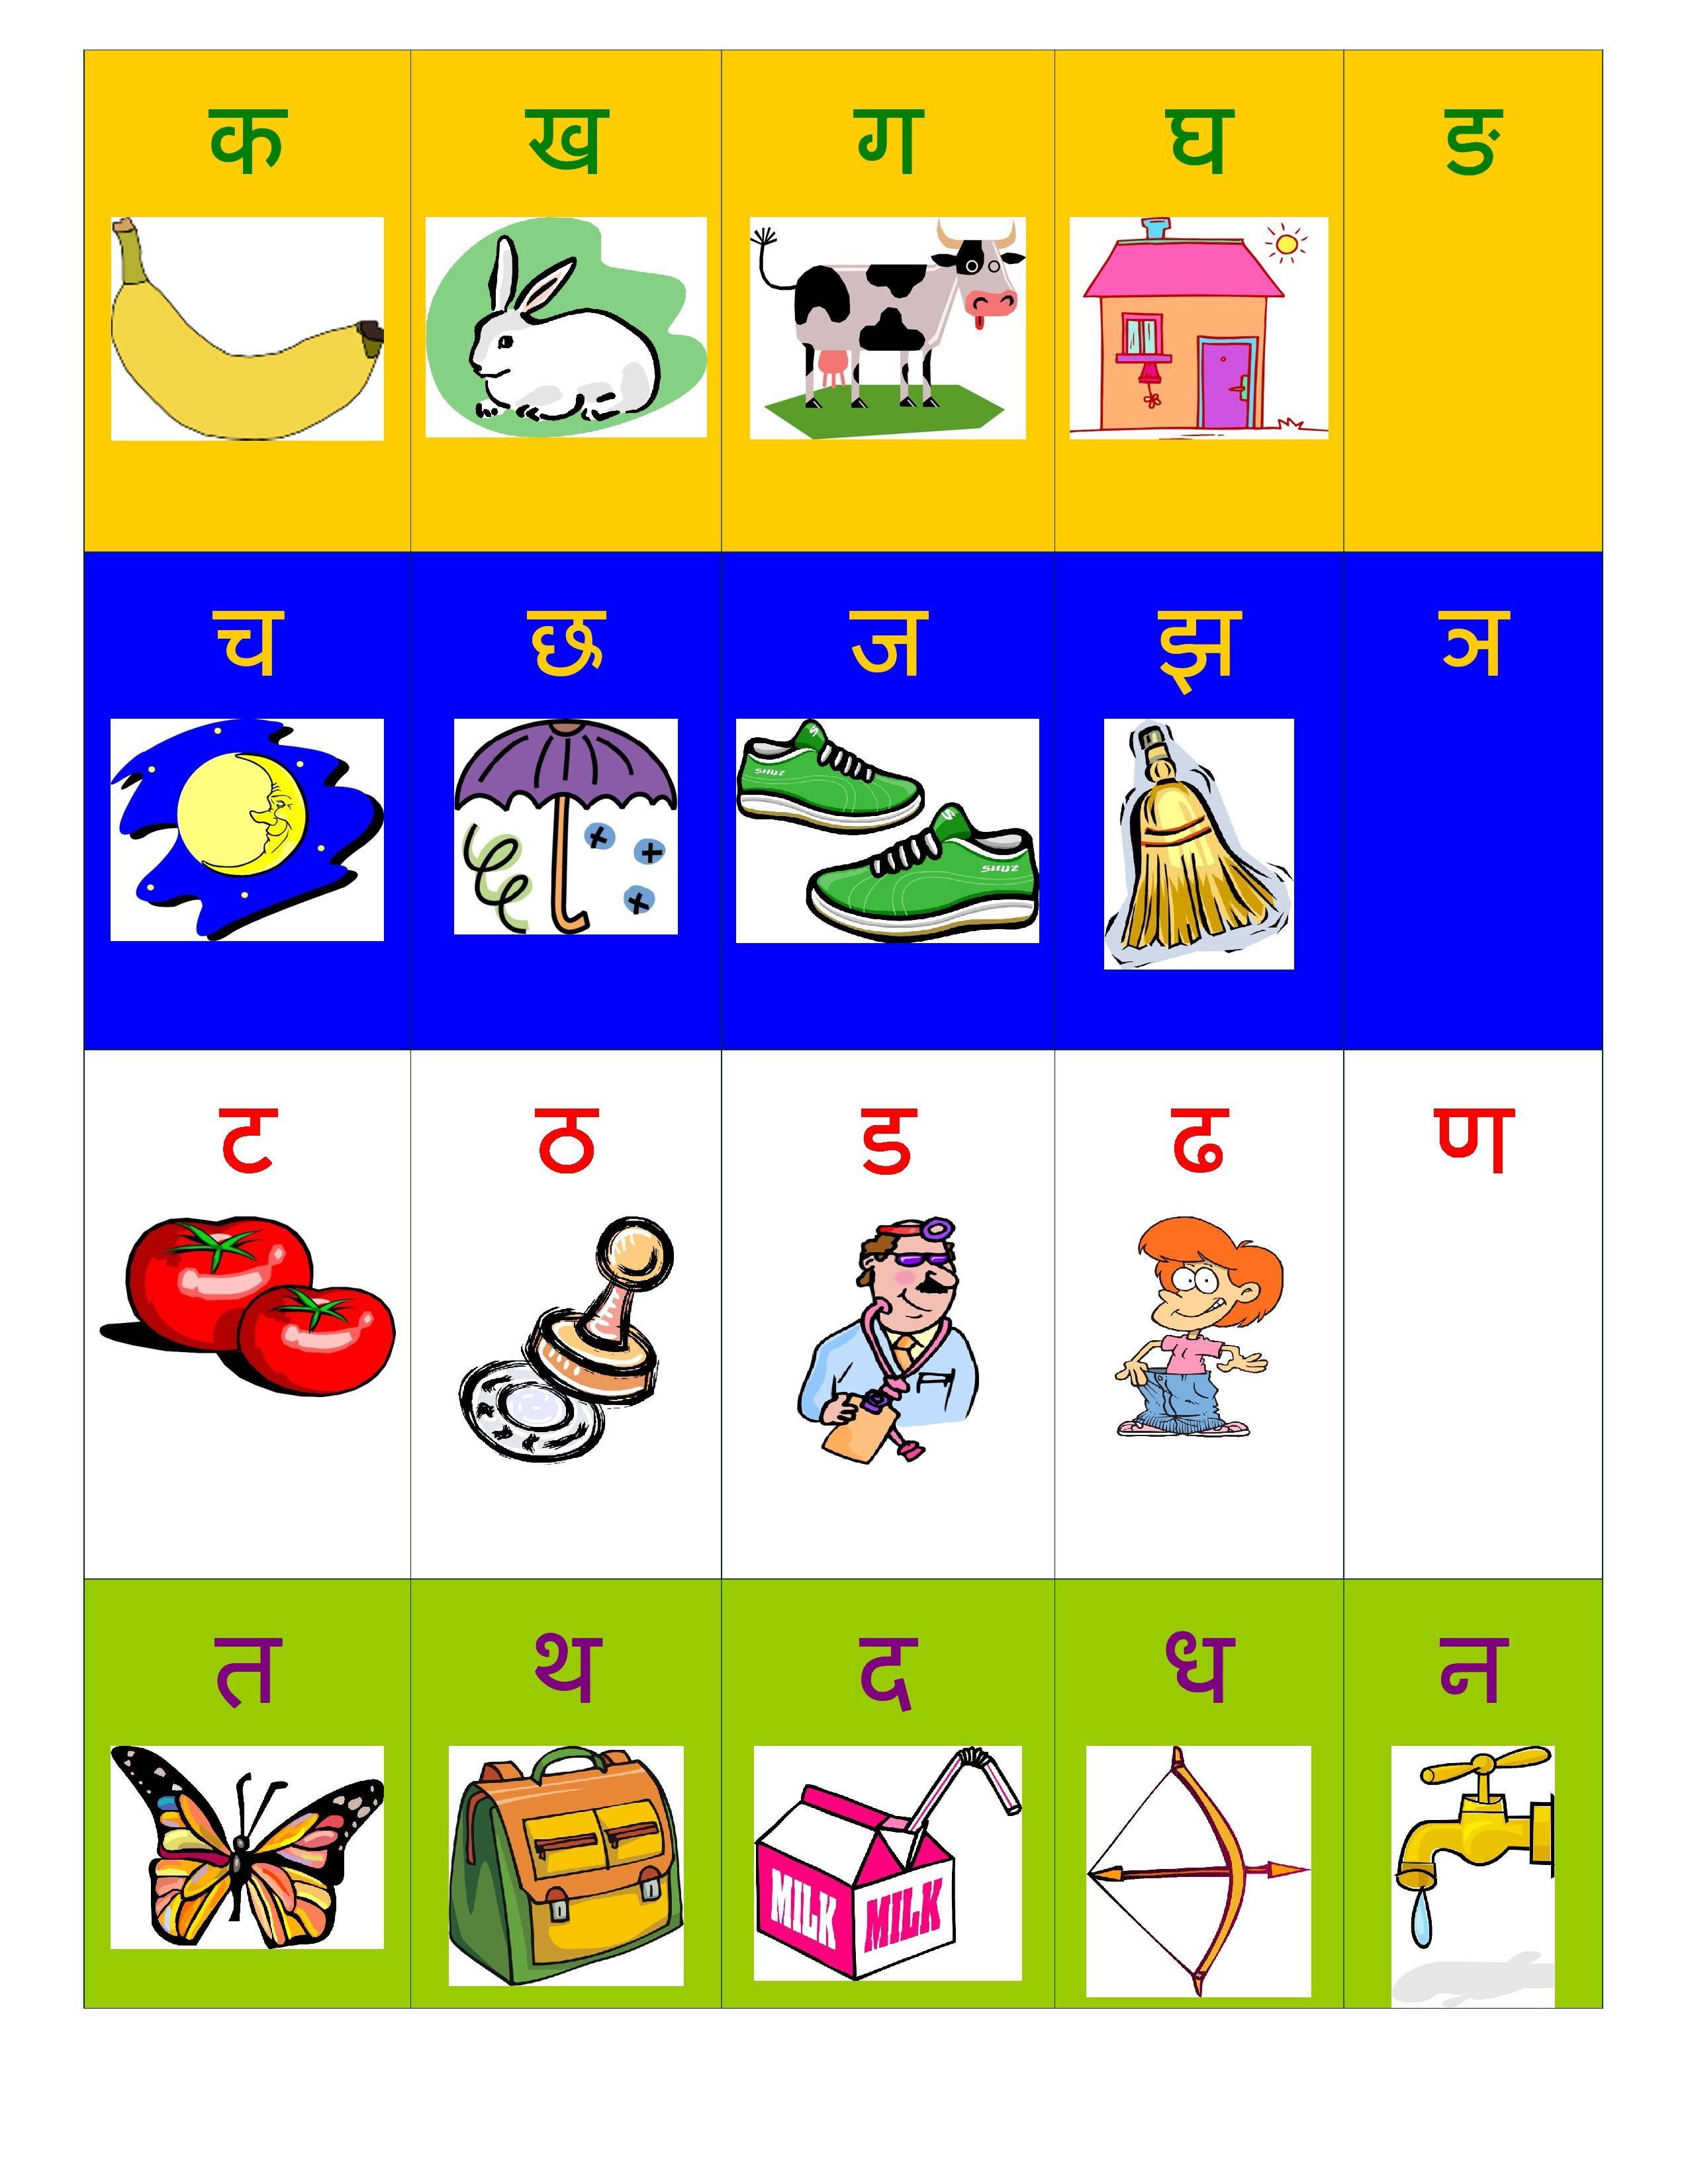 Hindi Alphabet Varnamala Chart Free. Print at Home! | Hindi Alphabet ...